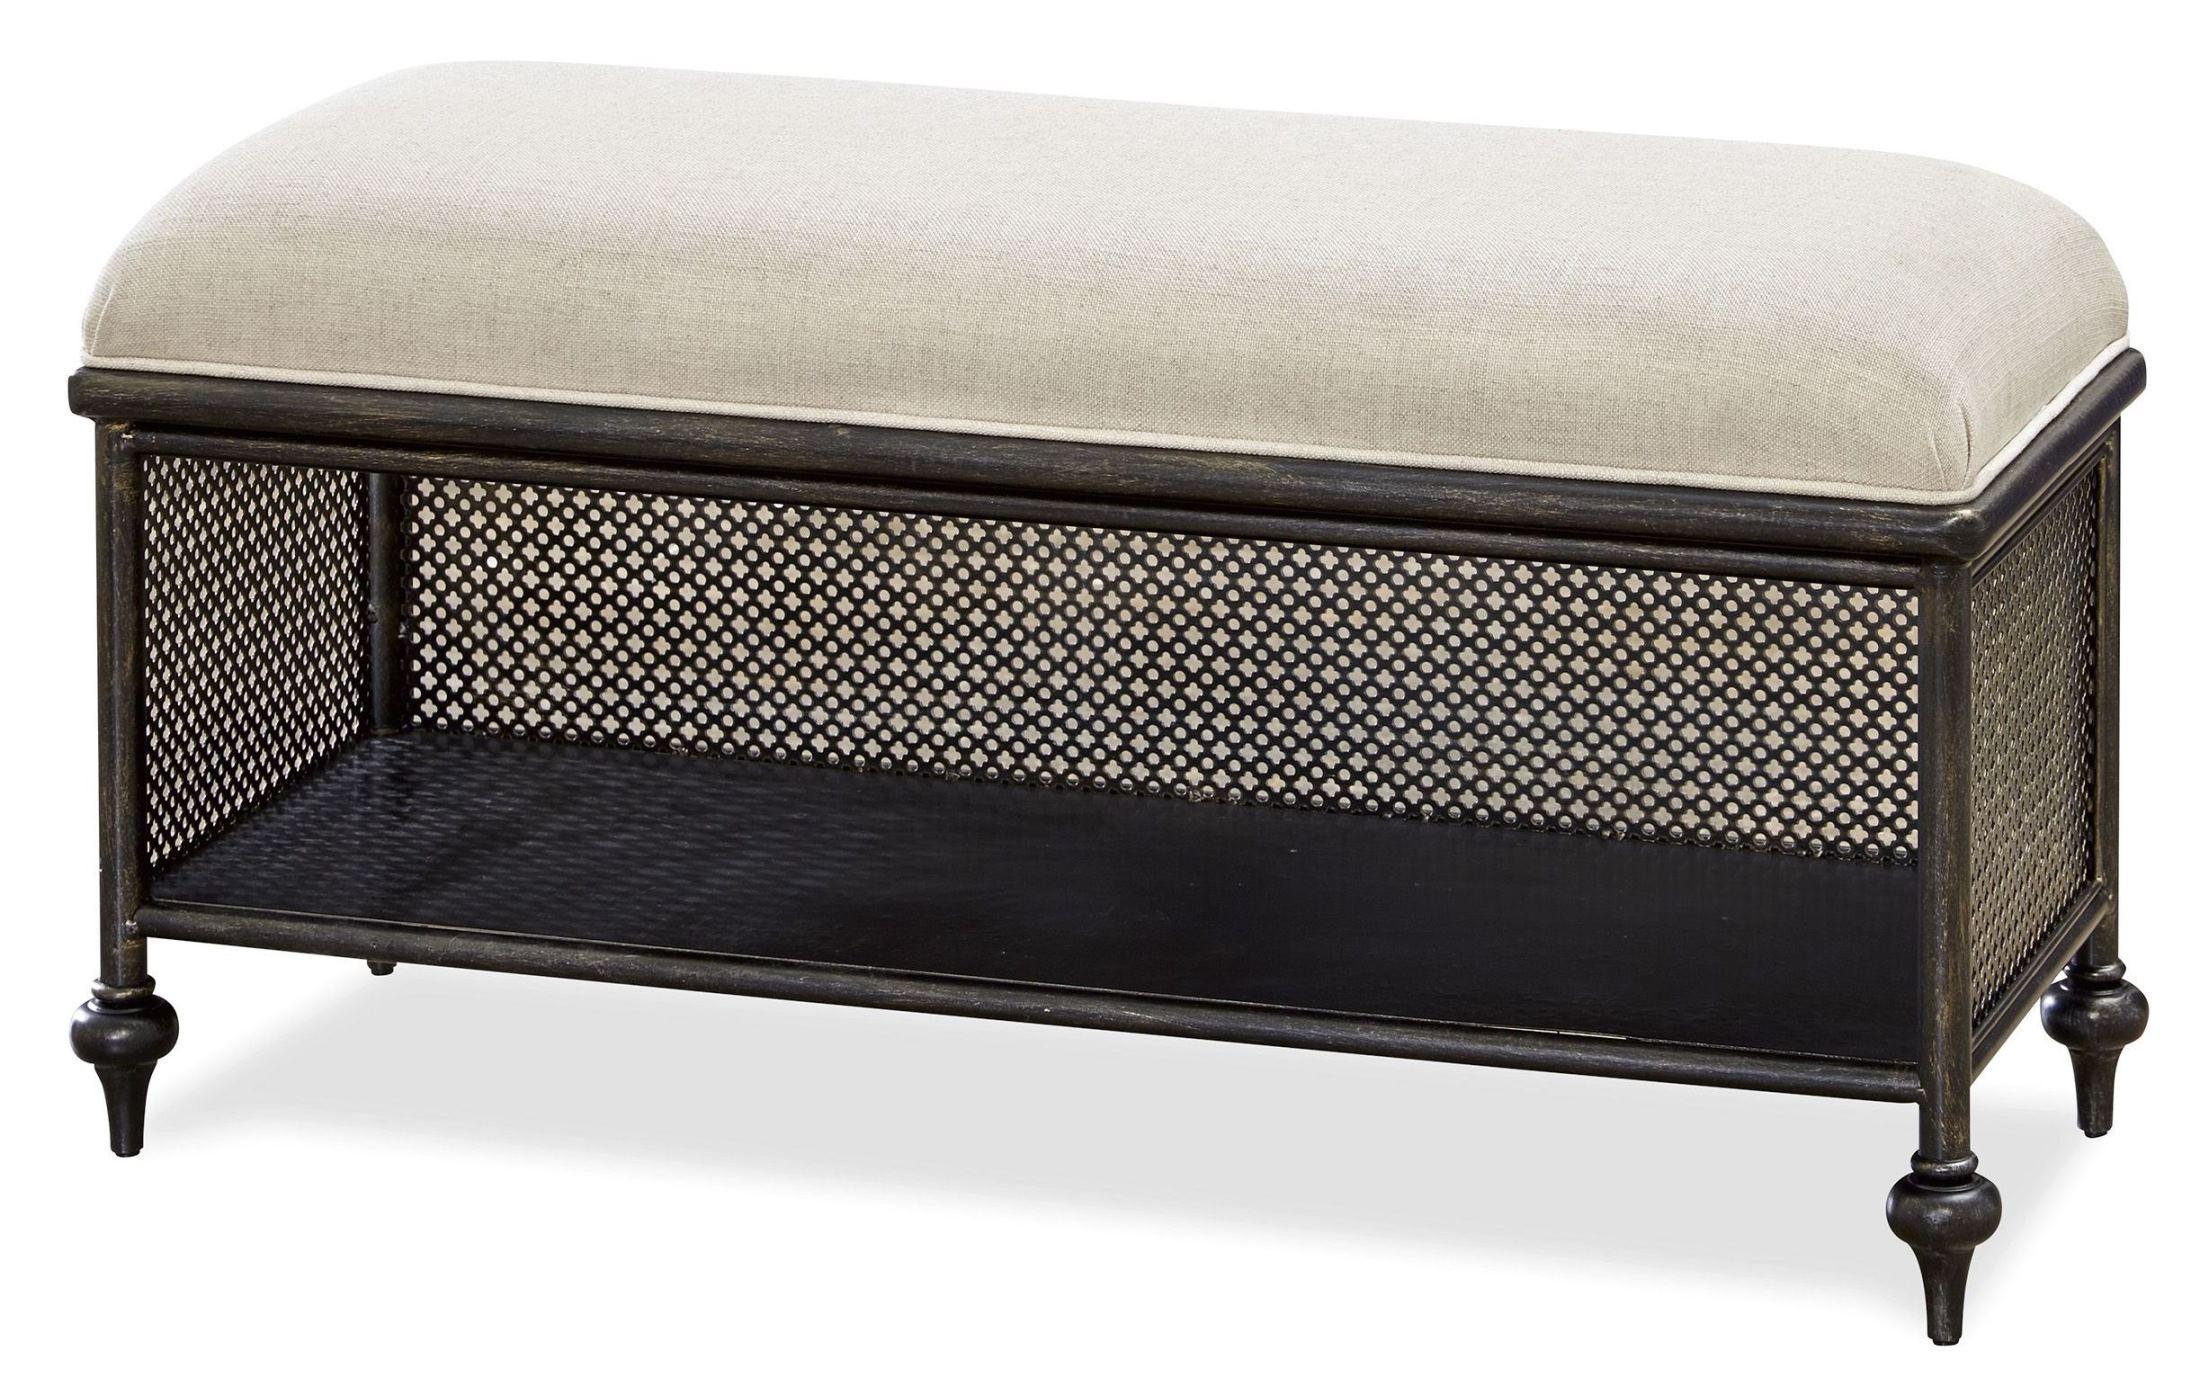 Smartstuff Black Metal Bed Bench From Smart Stuff 437b075 Coleman Furniture